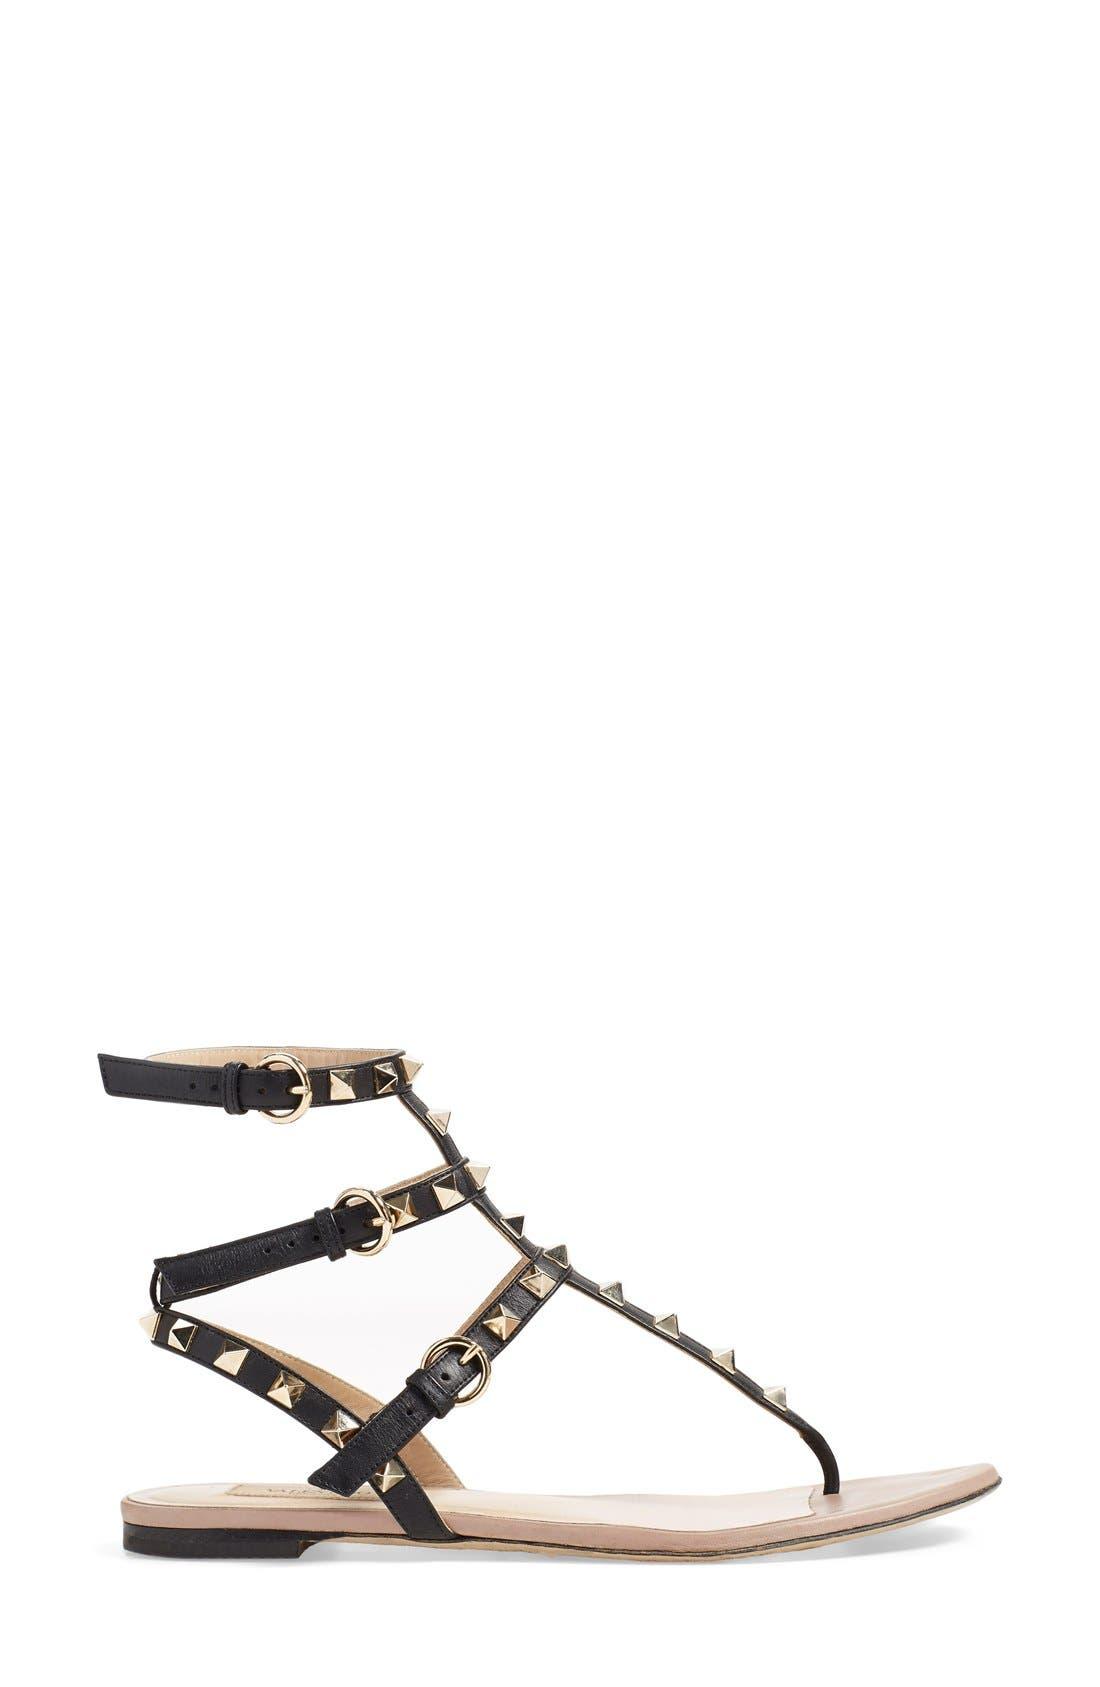 'Rockstud' Sandal,                             Alternate thumbnail 4, color,                             Black Leather